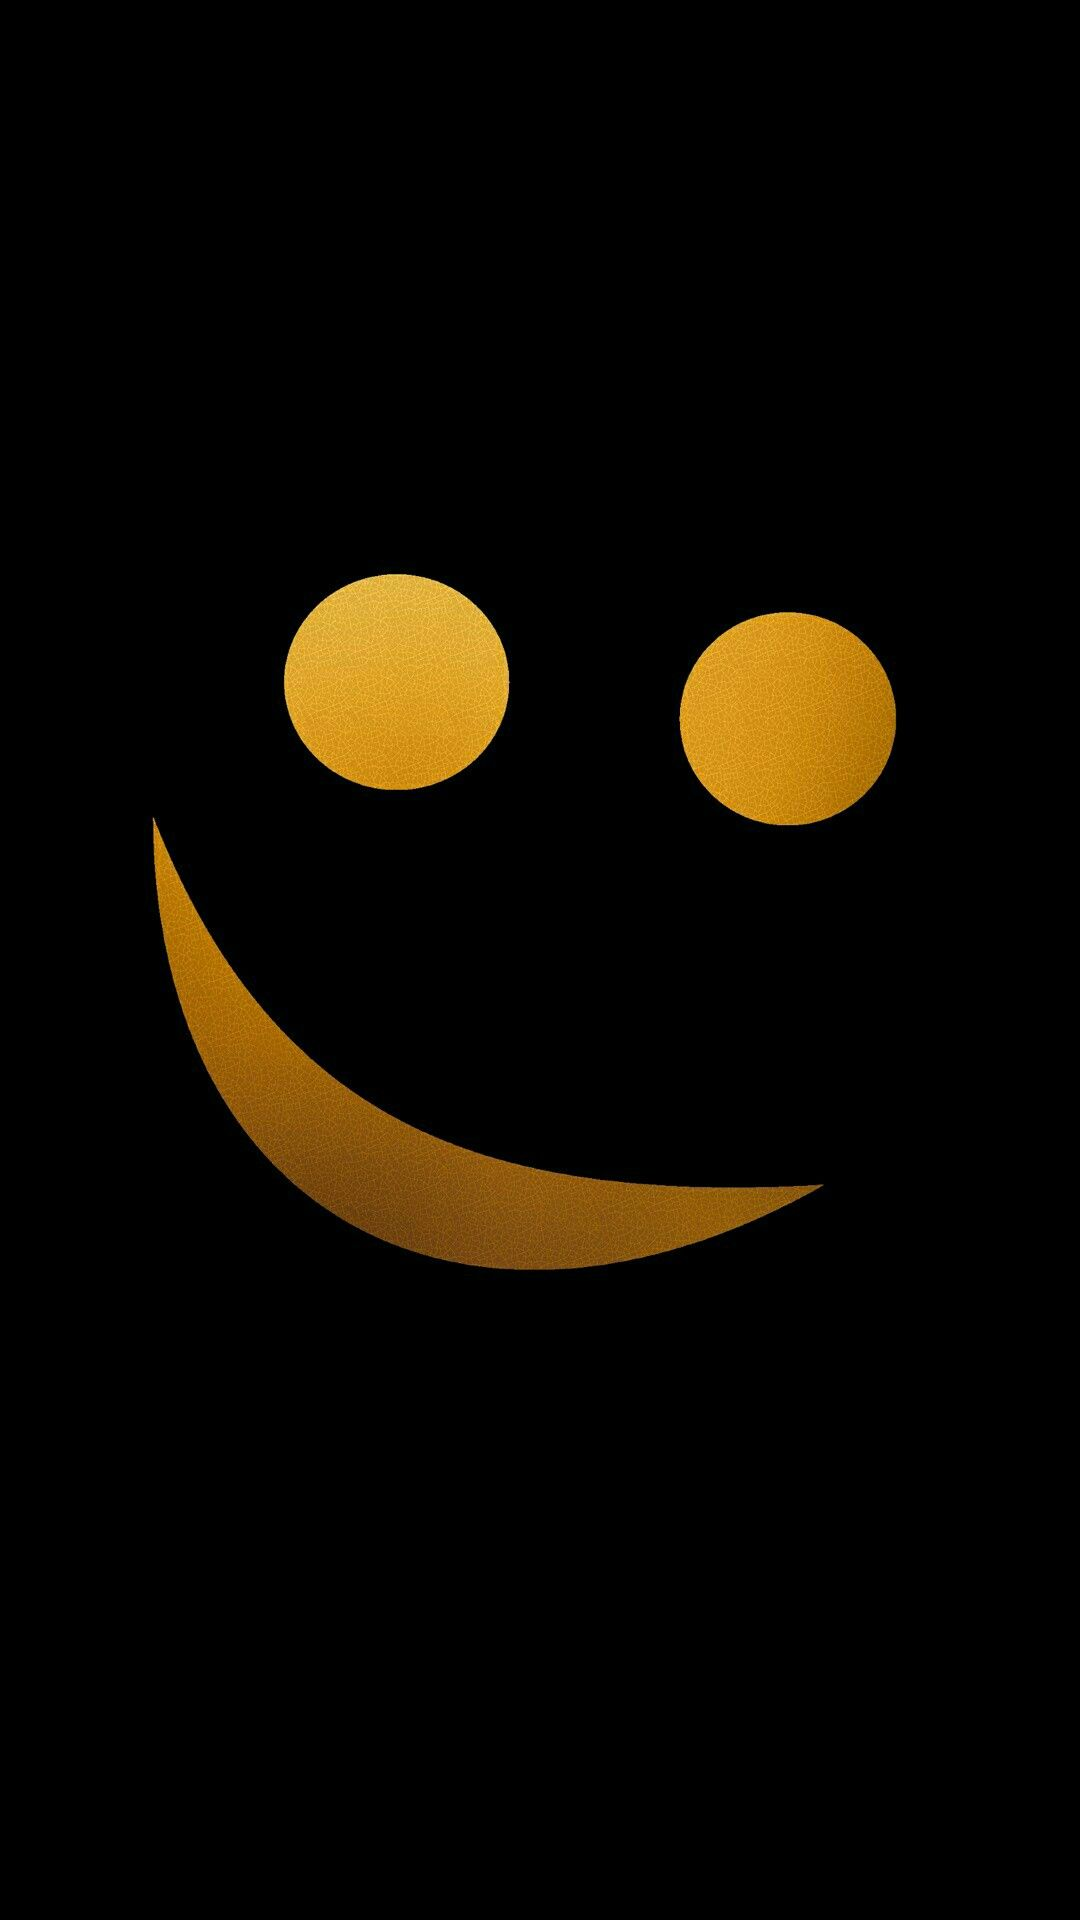 Wallpaper Hd Emoji - wallpaper